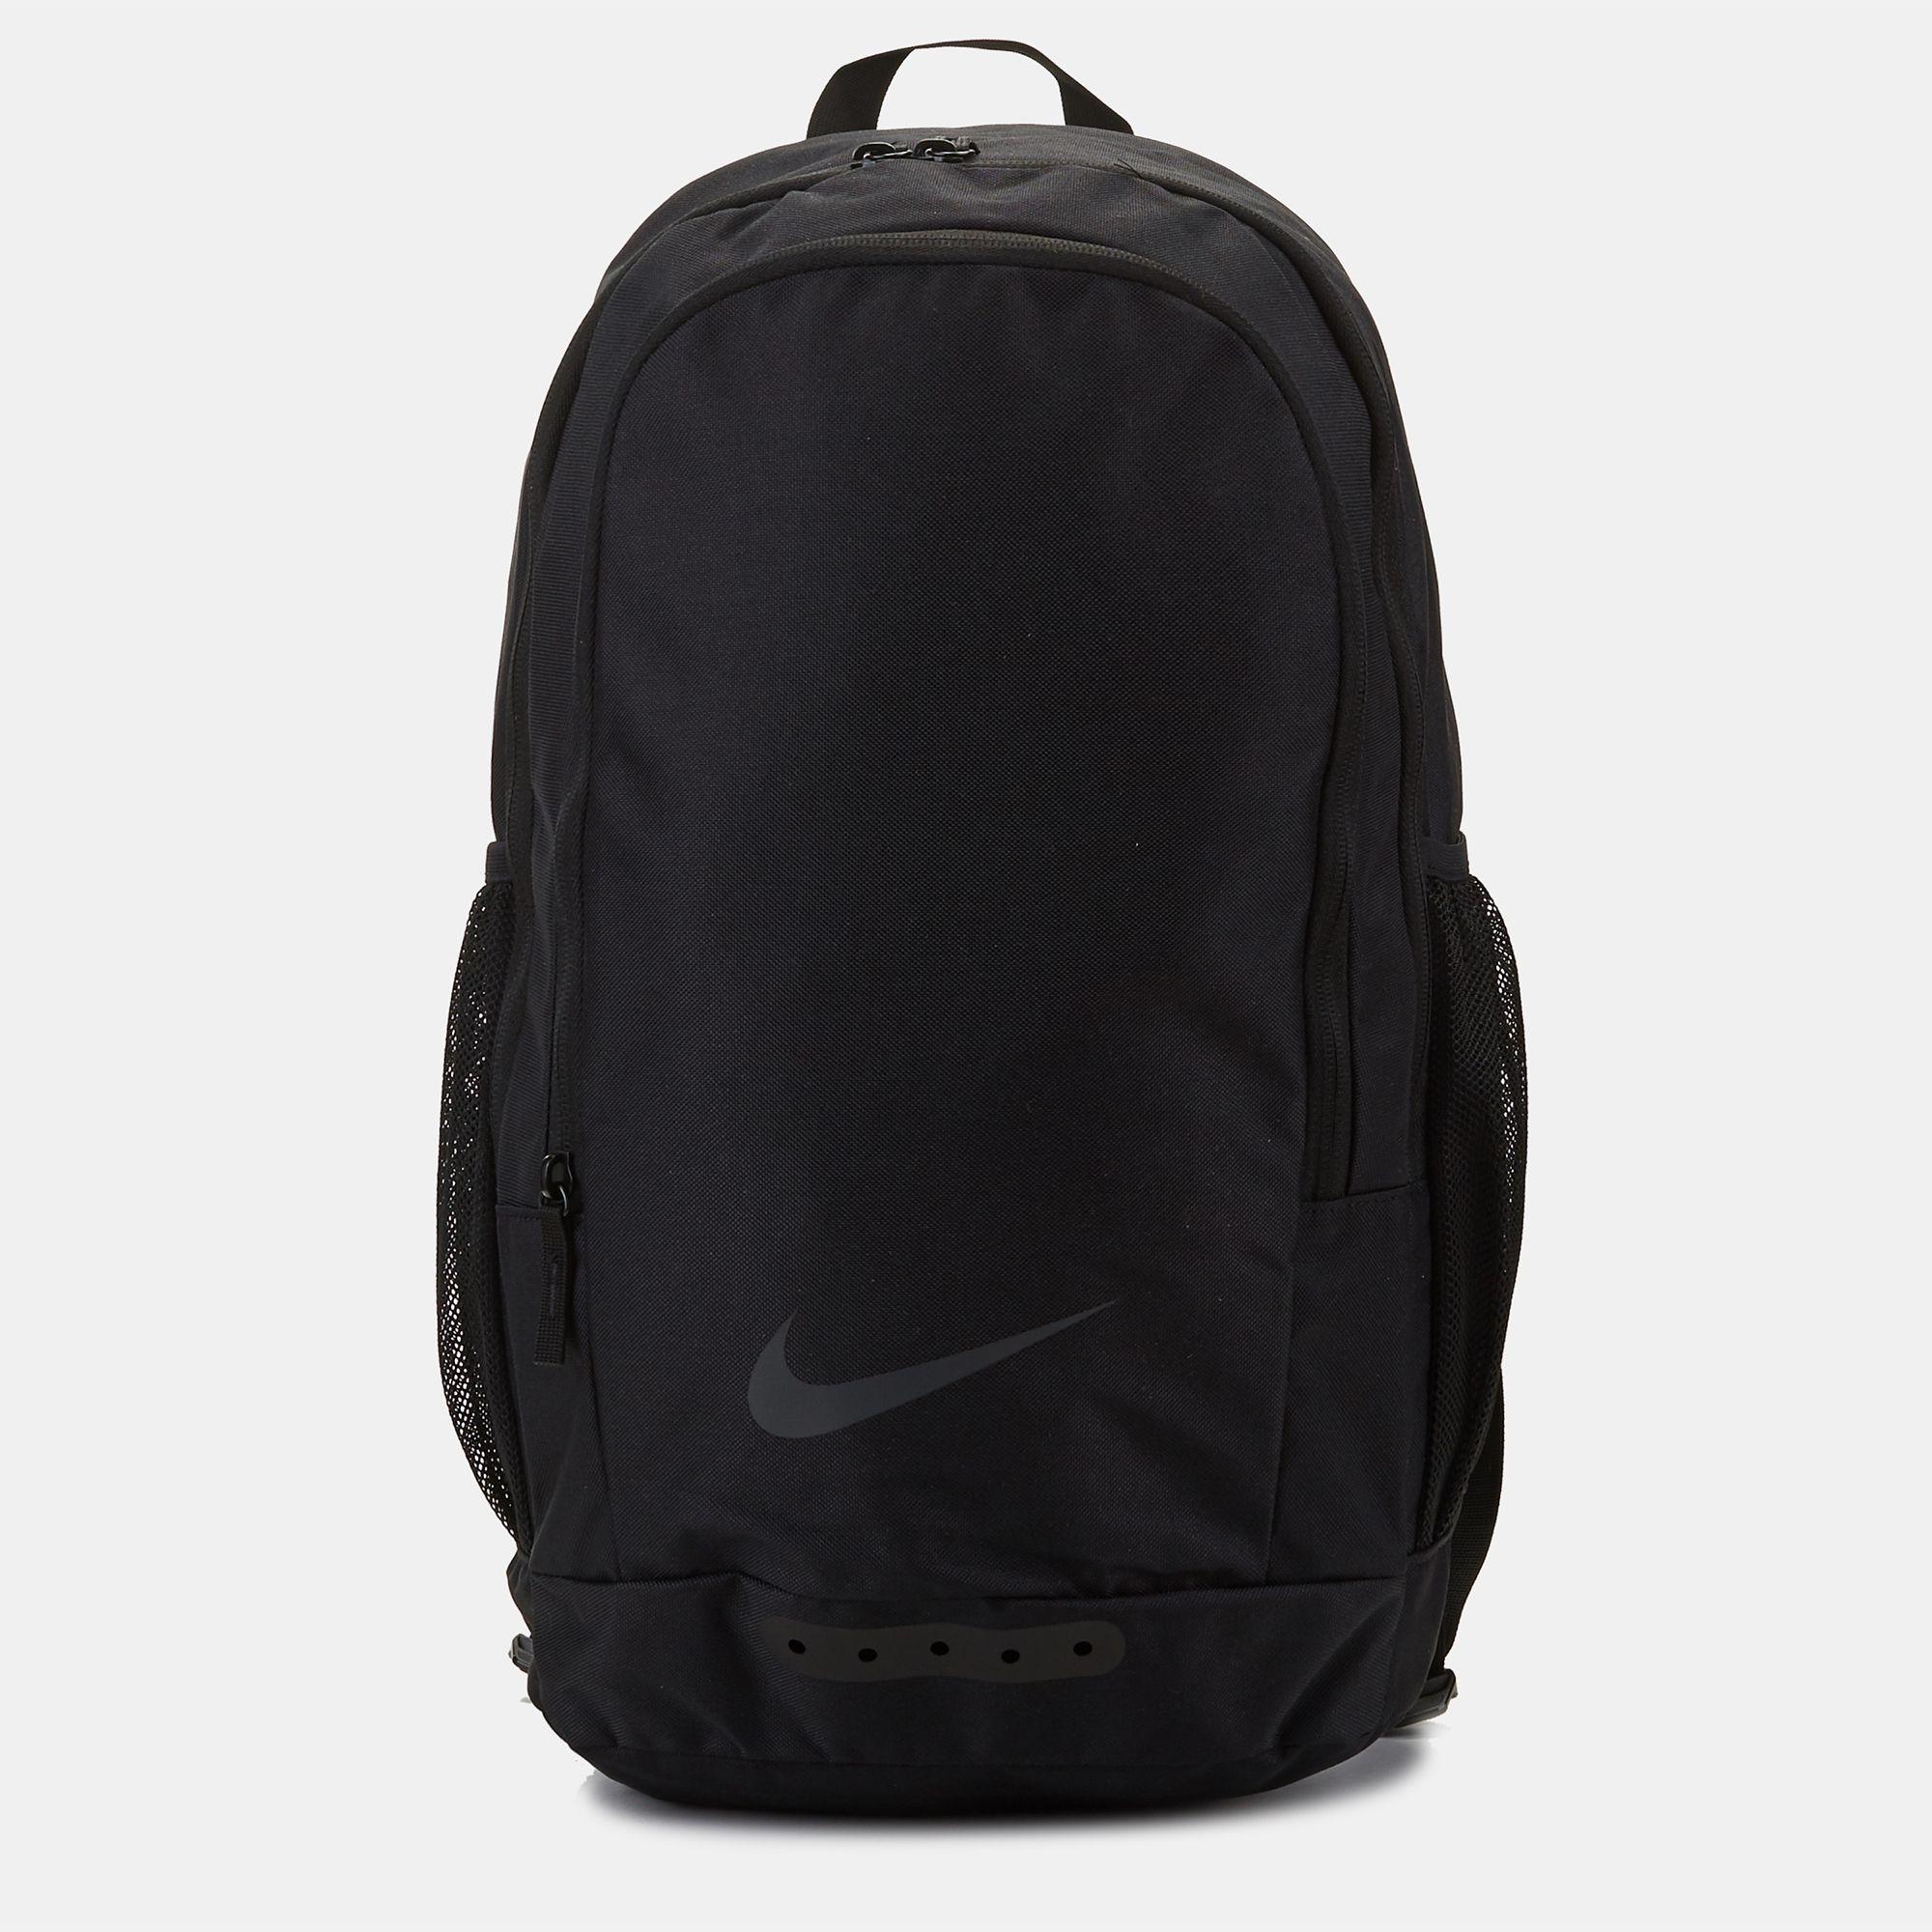 1418126f94 Nike Backpacks Academy Sports And Outdoors